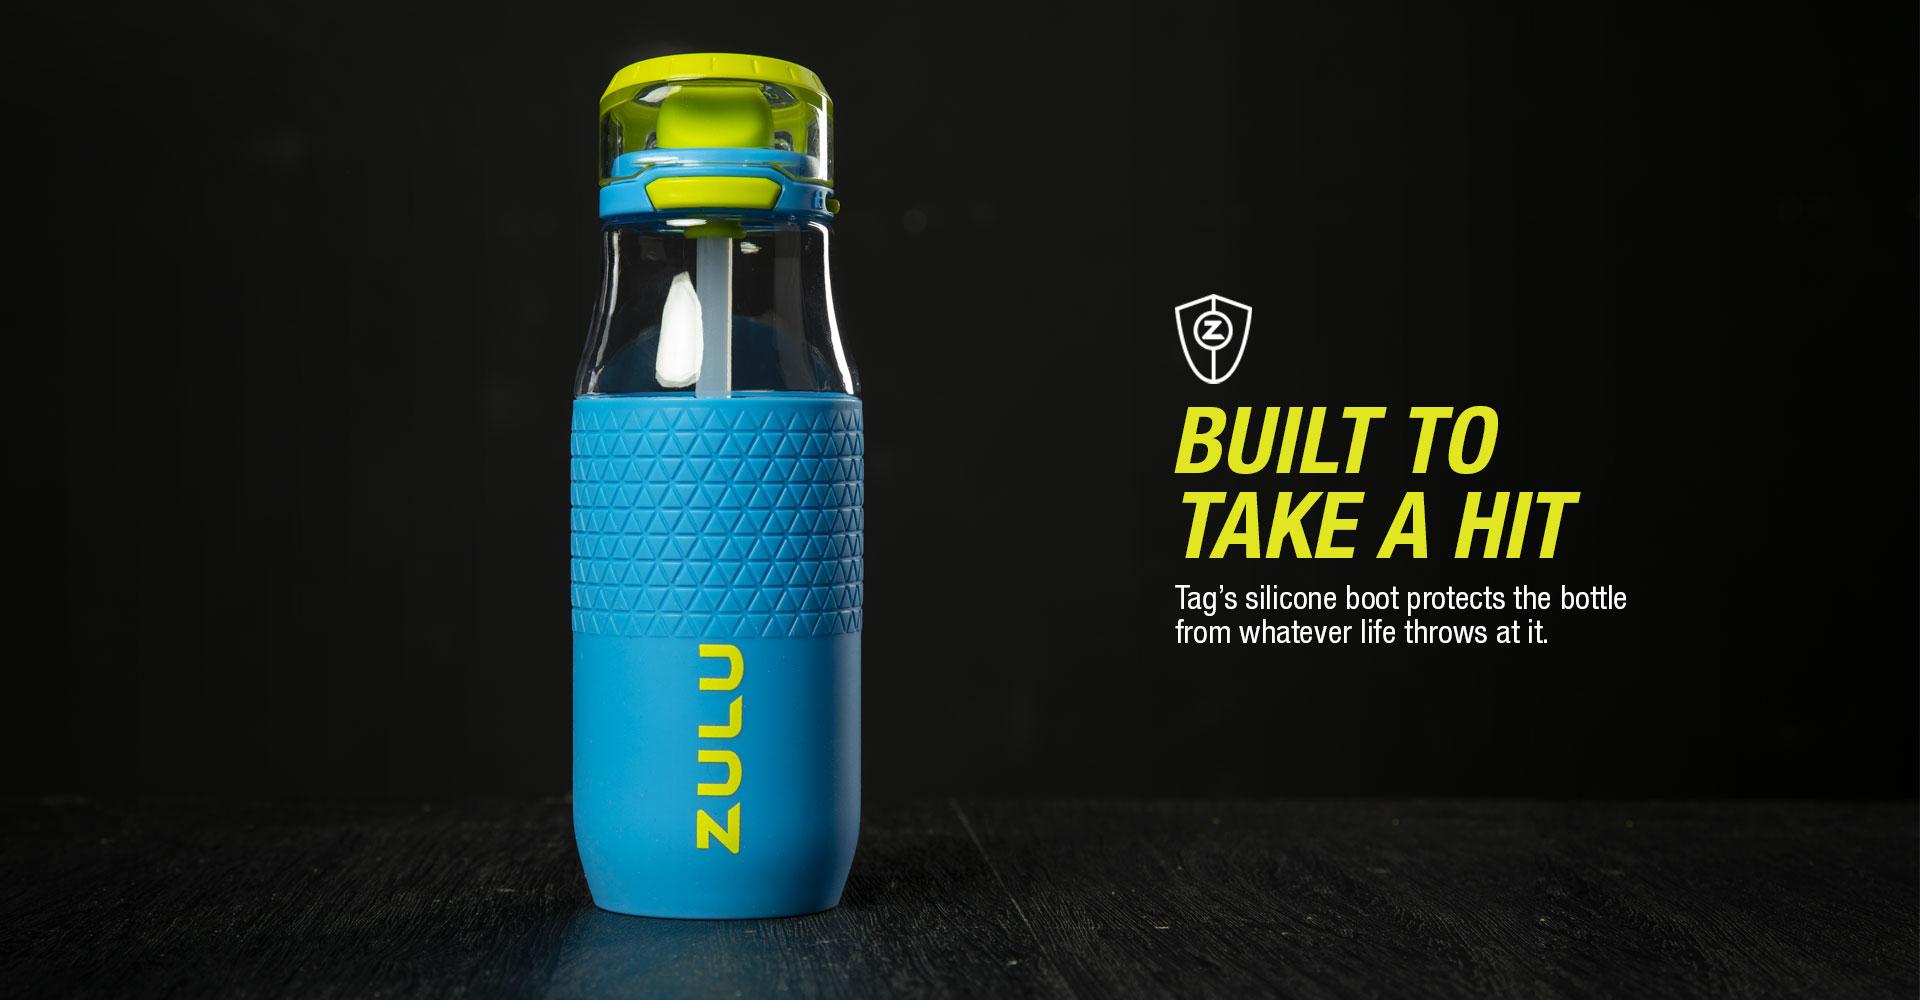 2019.01.31_Zulu_Tag-Kids-Water-Bottle_Banner01_Bulit-to-take-a-hit.jpg